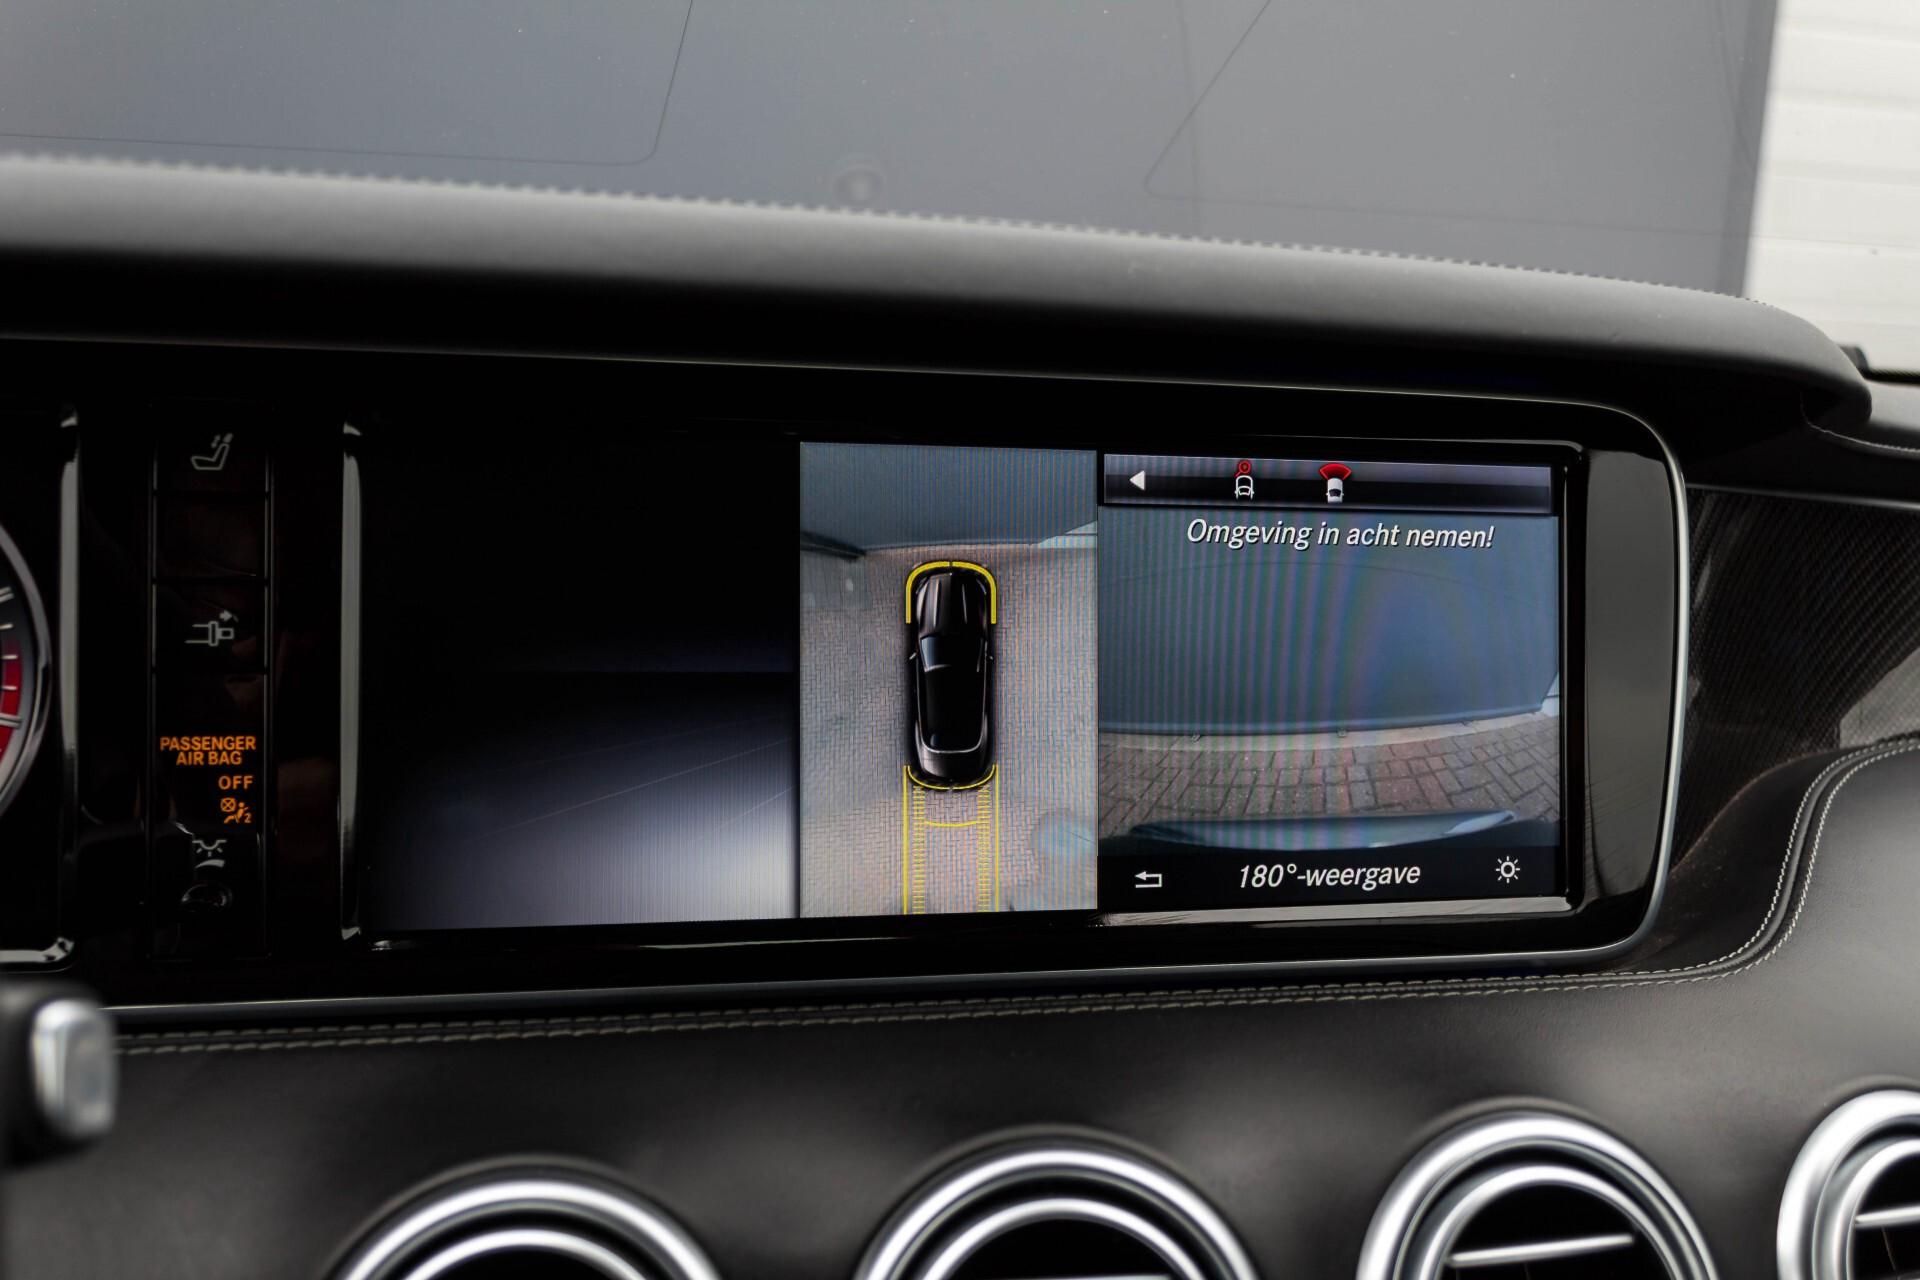 Mercedes-Benz S-Klasse Cabrio 63 AMG 4-M Ceramic/Designo/Carbon/Burmester High End Aut Foto 27